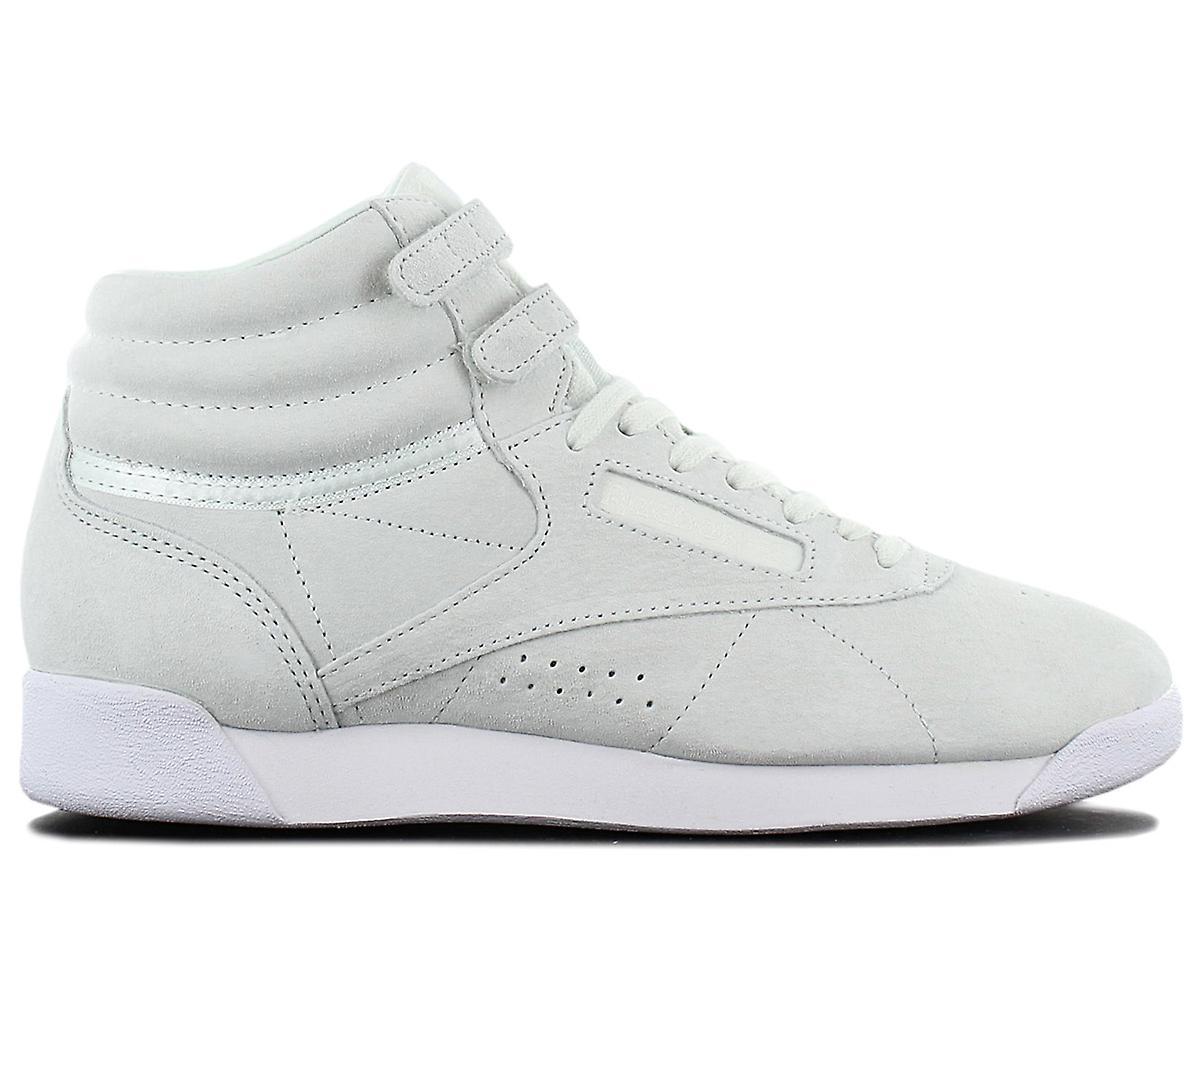 Reebok Wmns Freestyle Hi NBK Leather Damen Schuhe Opal-Grün CN0604 Sneakers Sportschuhe 51NKc